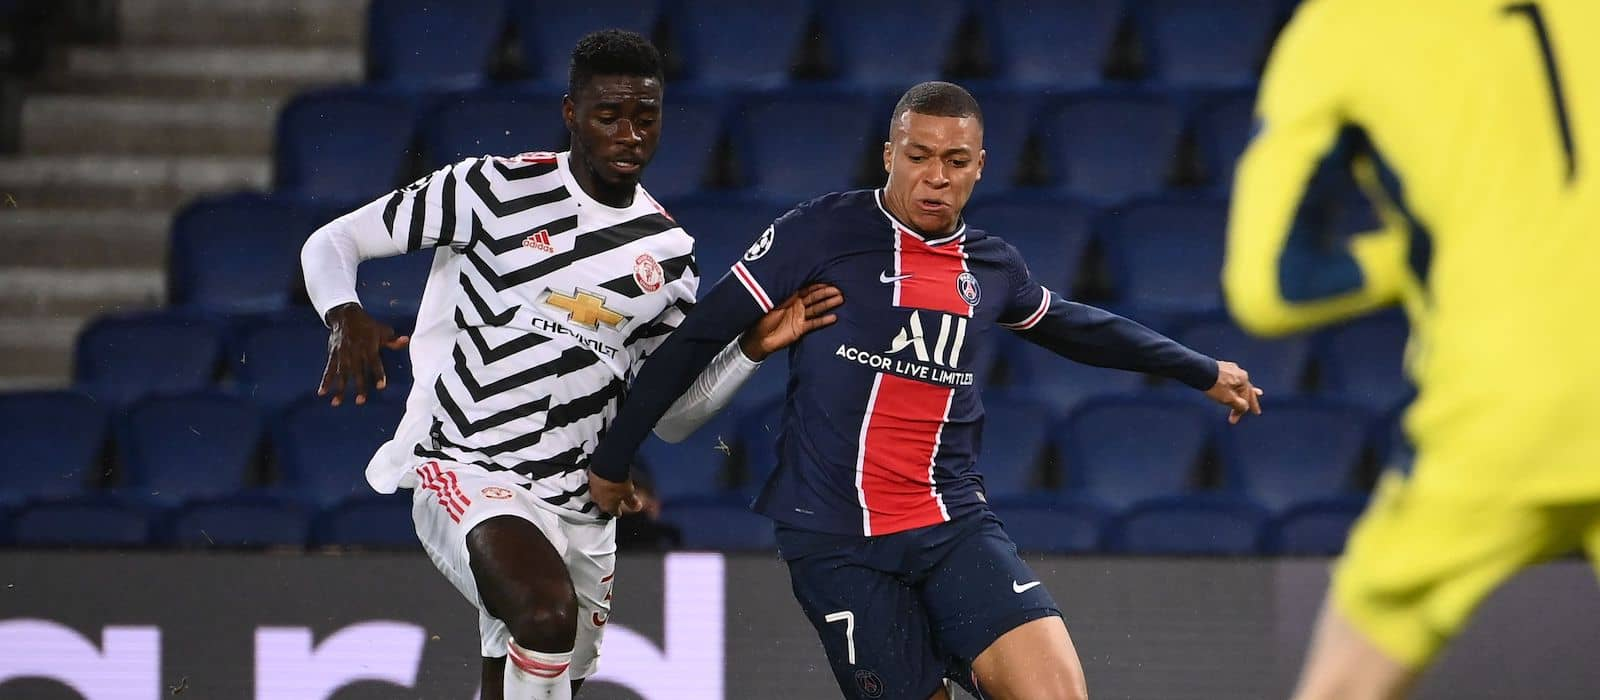 Rio Ferdinand lauds Axel Tuanzebe for solid display vs PSG